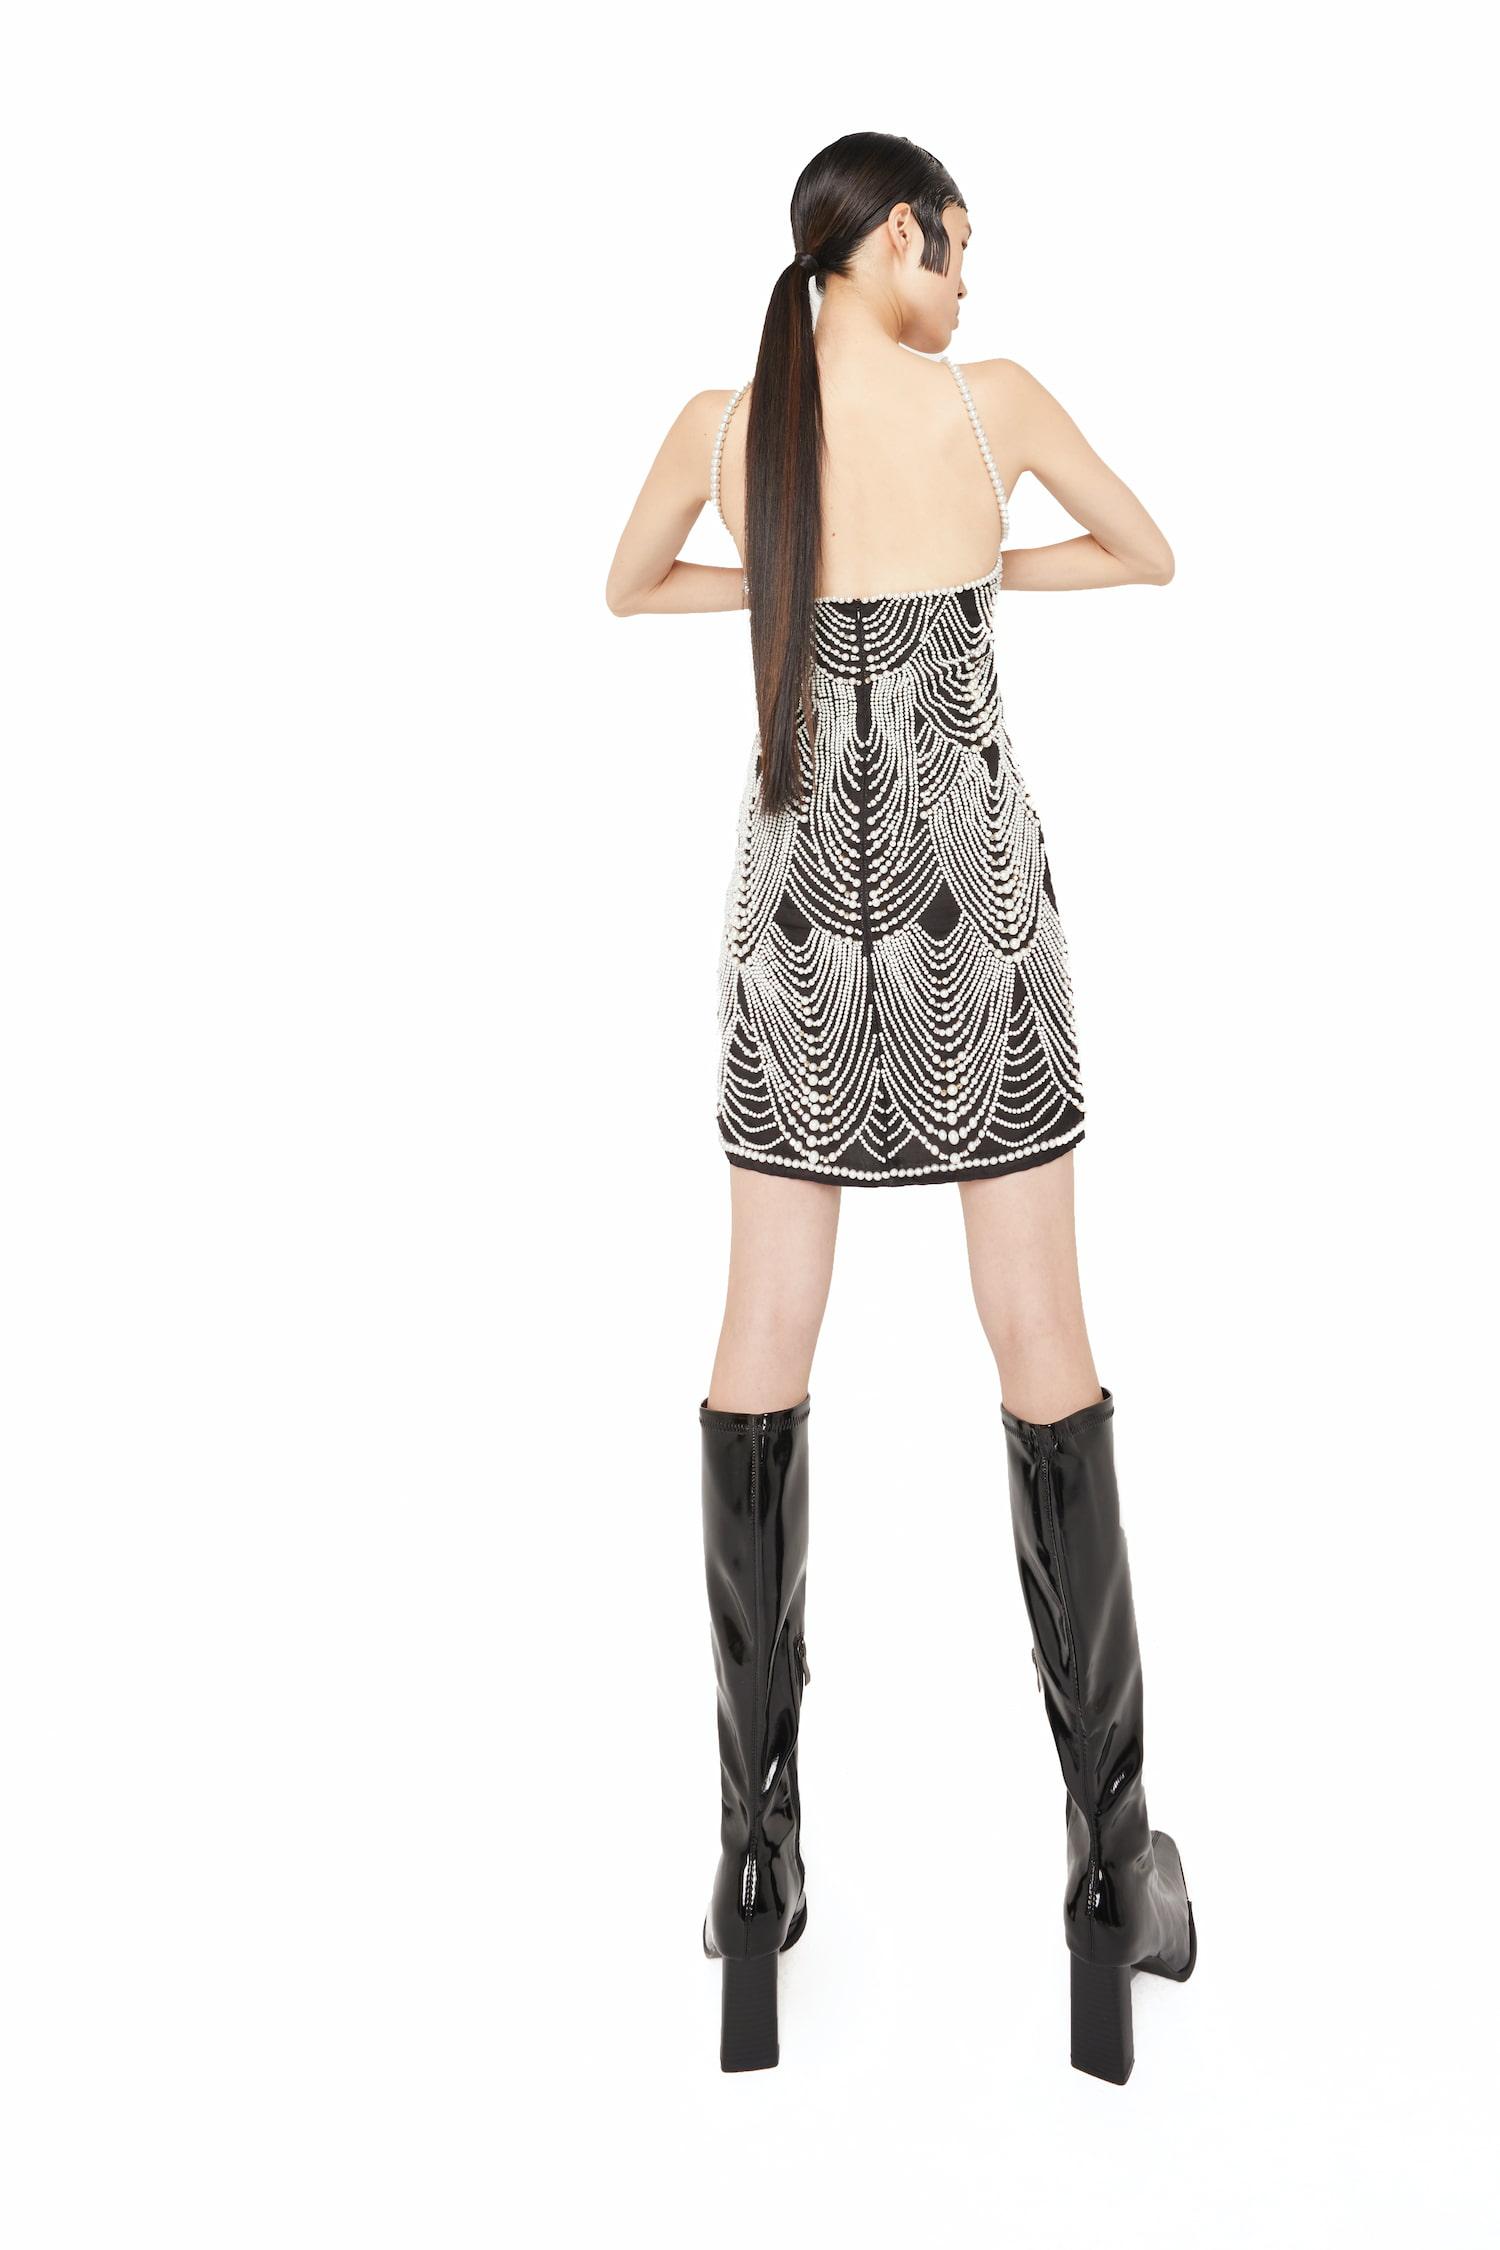 View 5 of model wearing Khha Mini Dress in black.